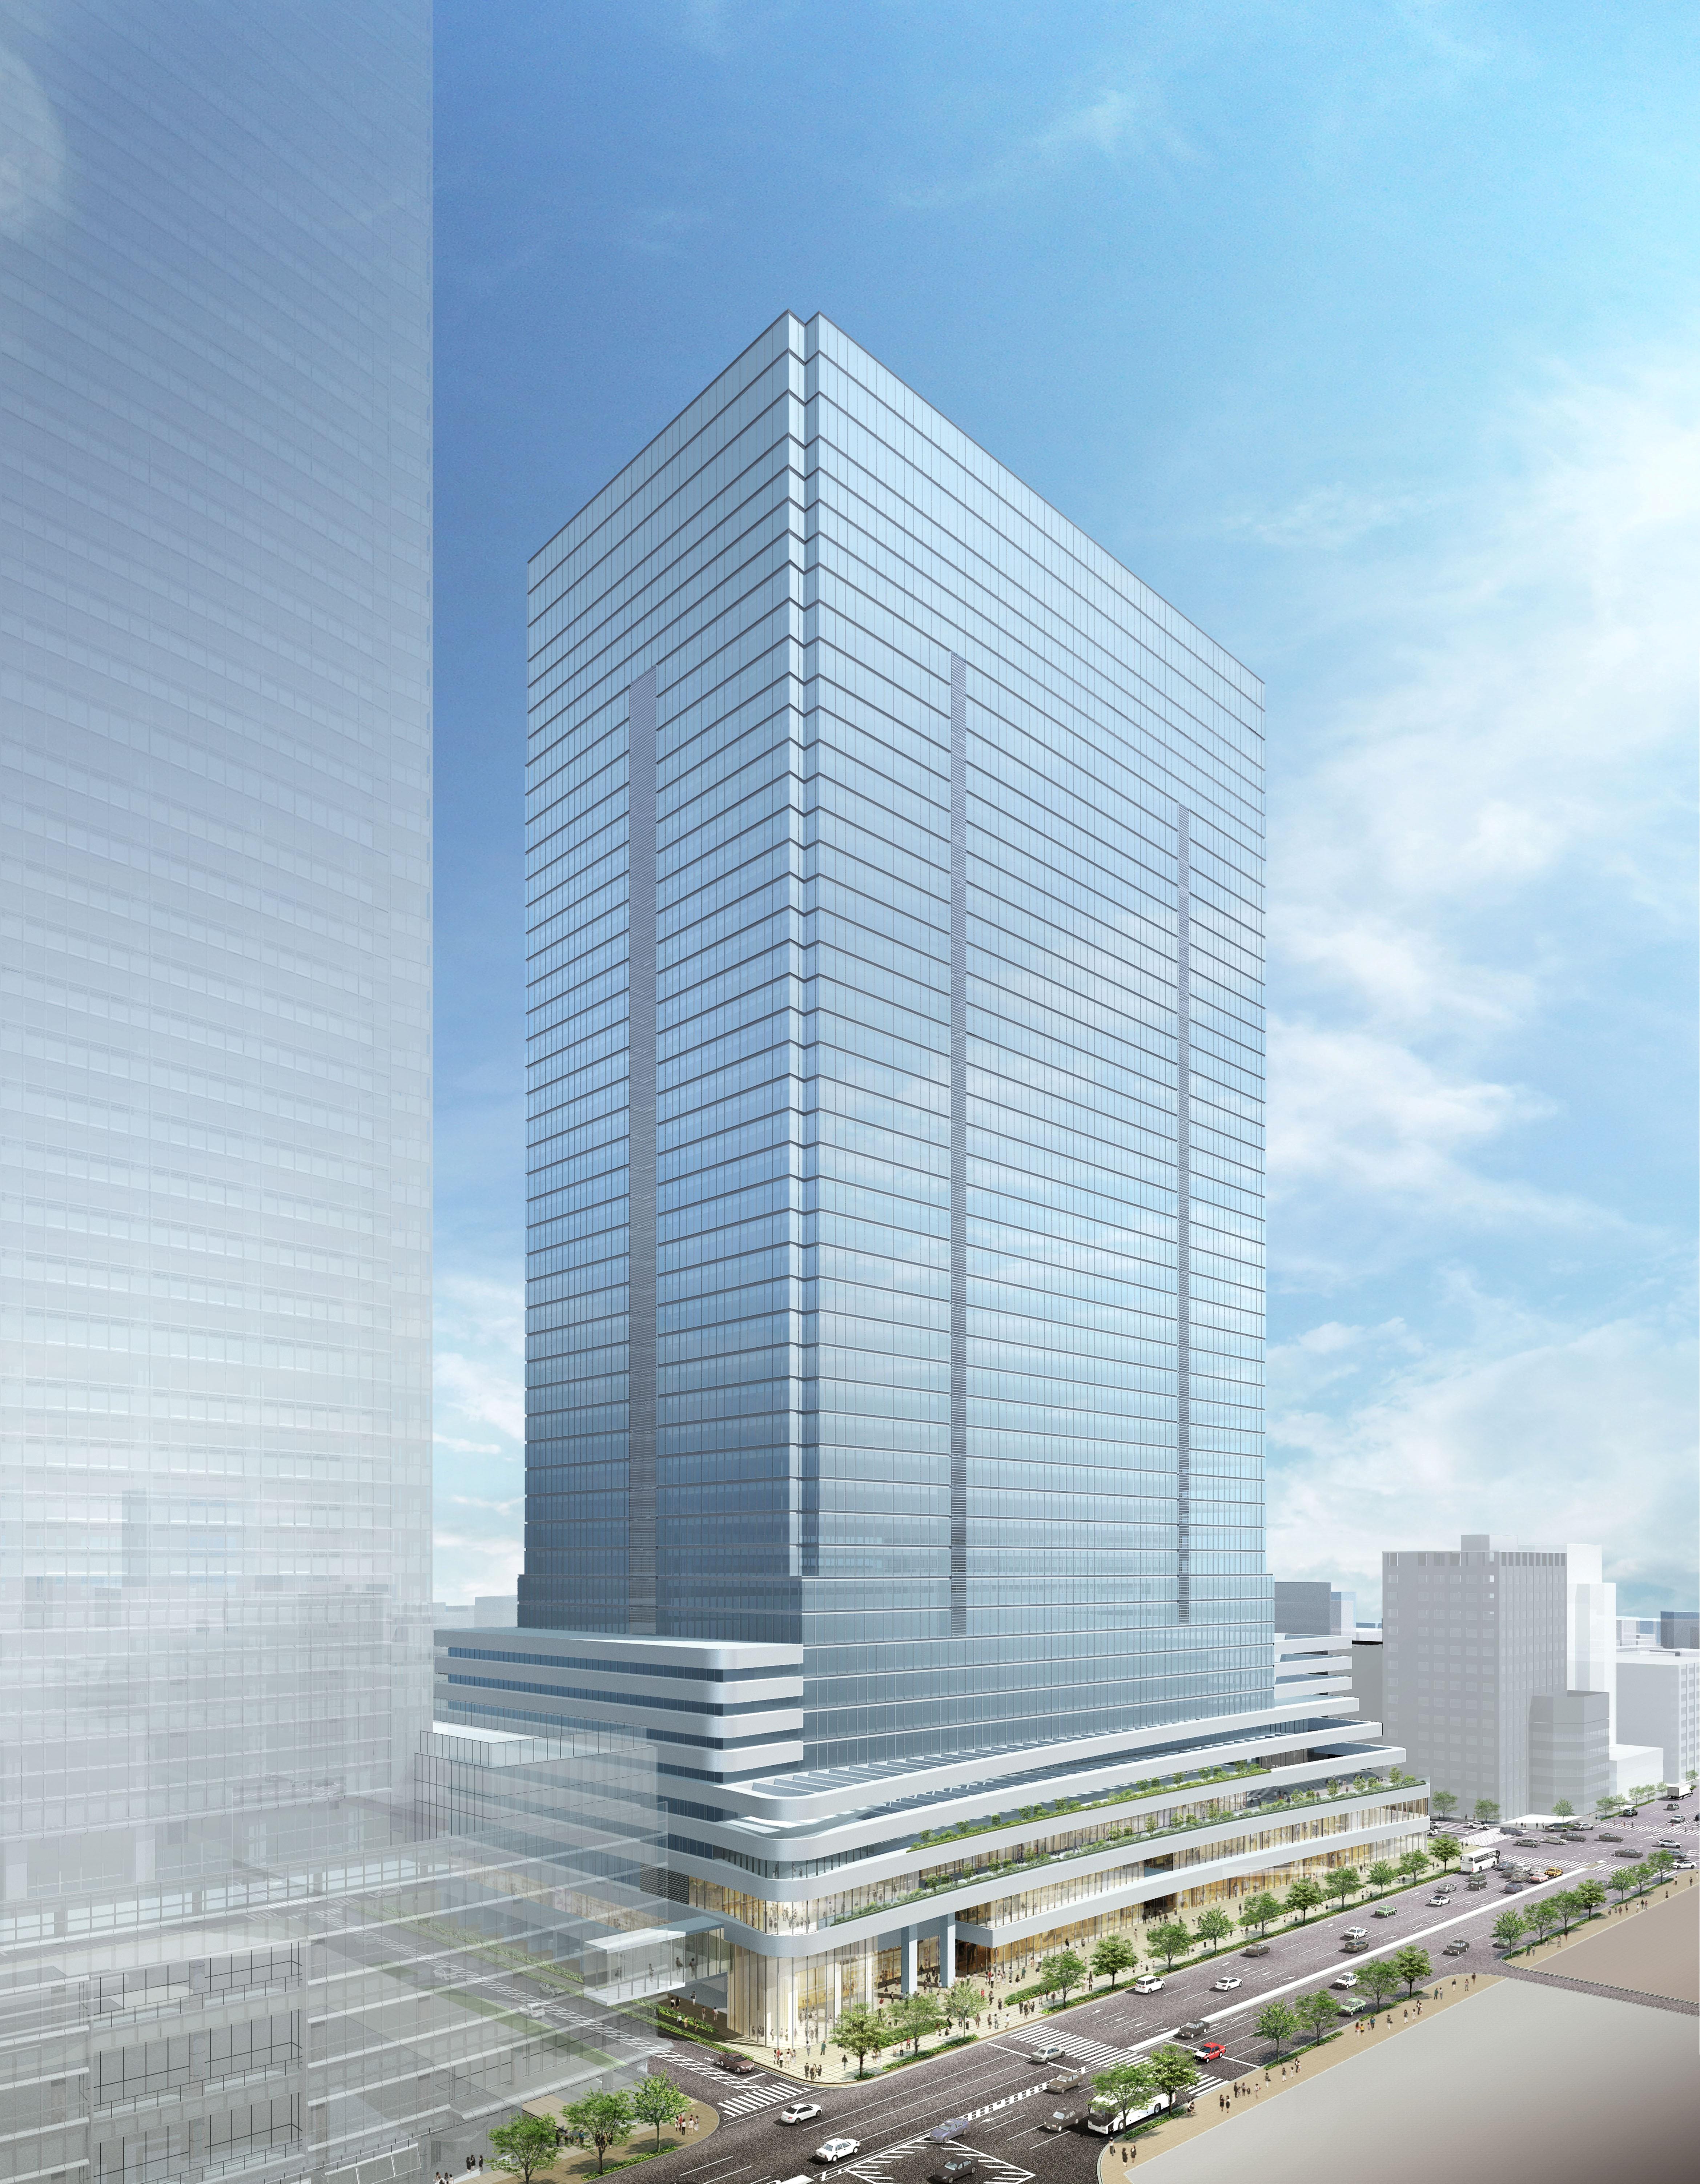 「八重洲二丁目中地区第一種市街地再開発事業」市街地再開発組合設立のお知らせ